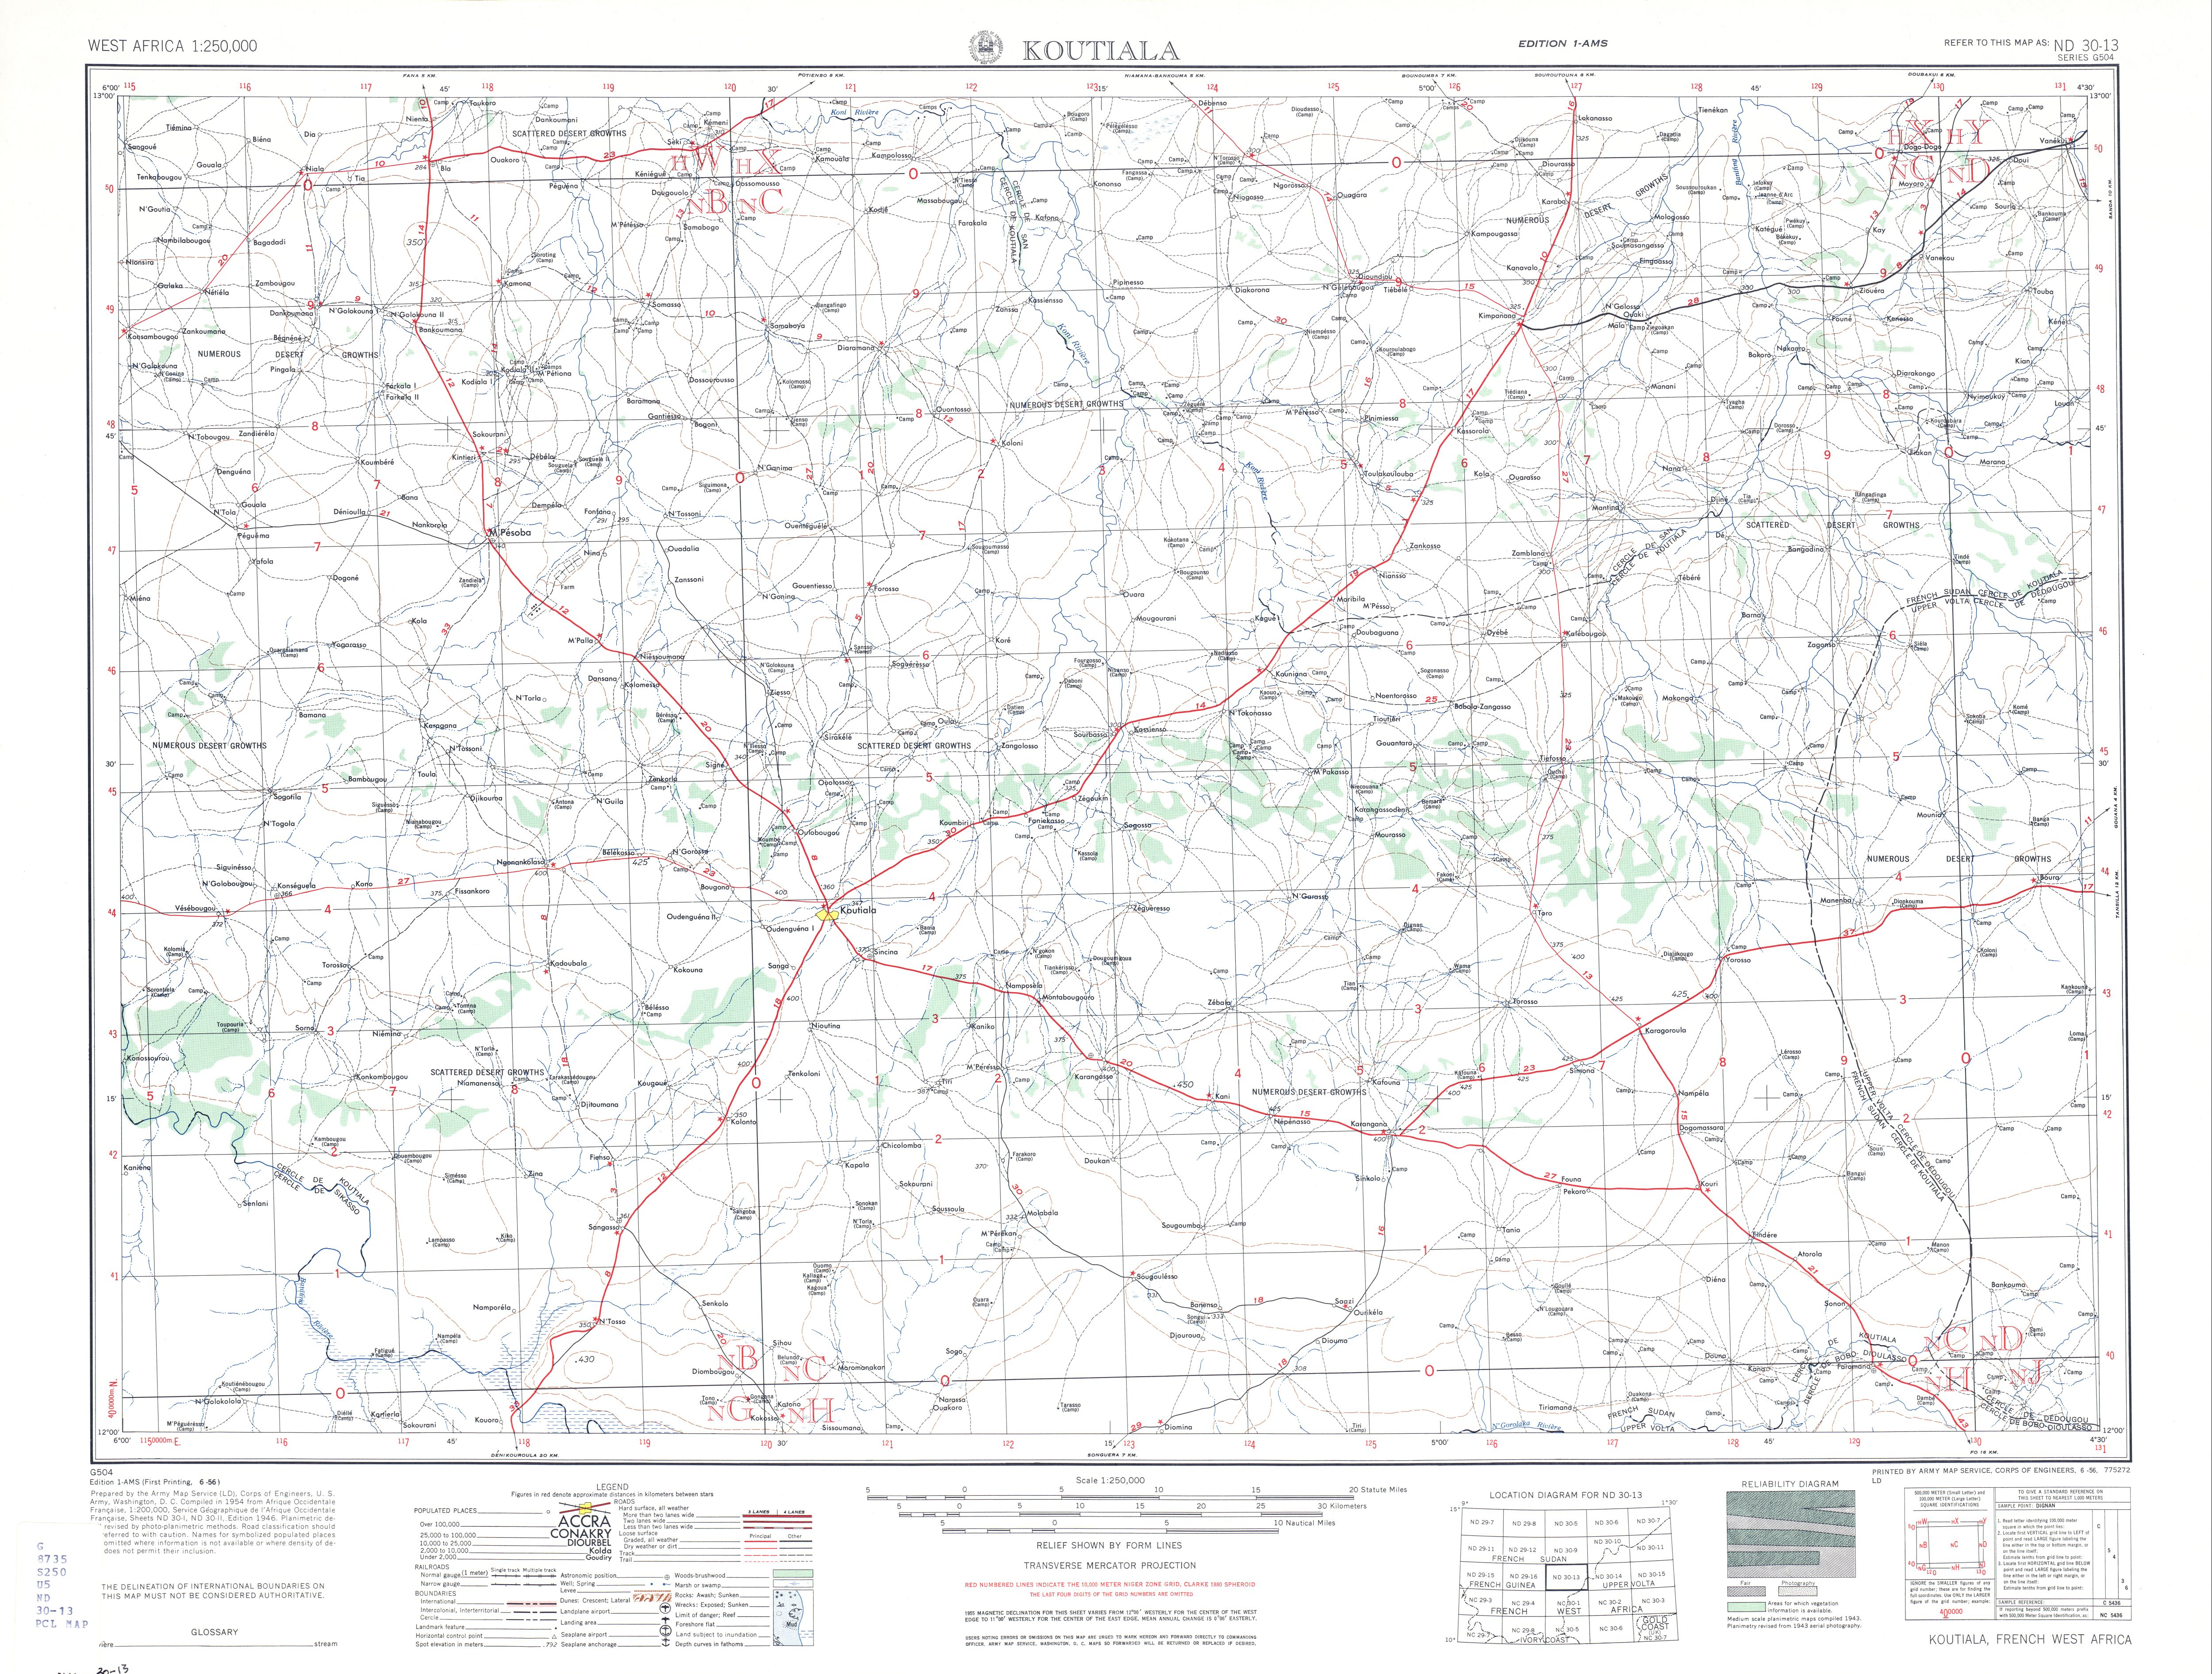 Hoja Koutiala del Mapa Topográfico de África Occidental 1955